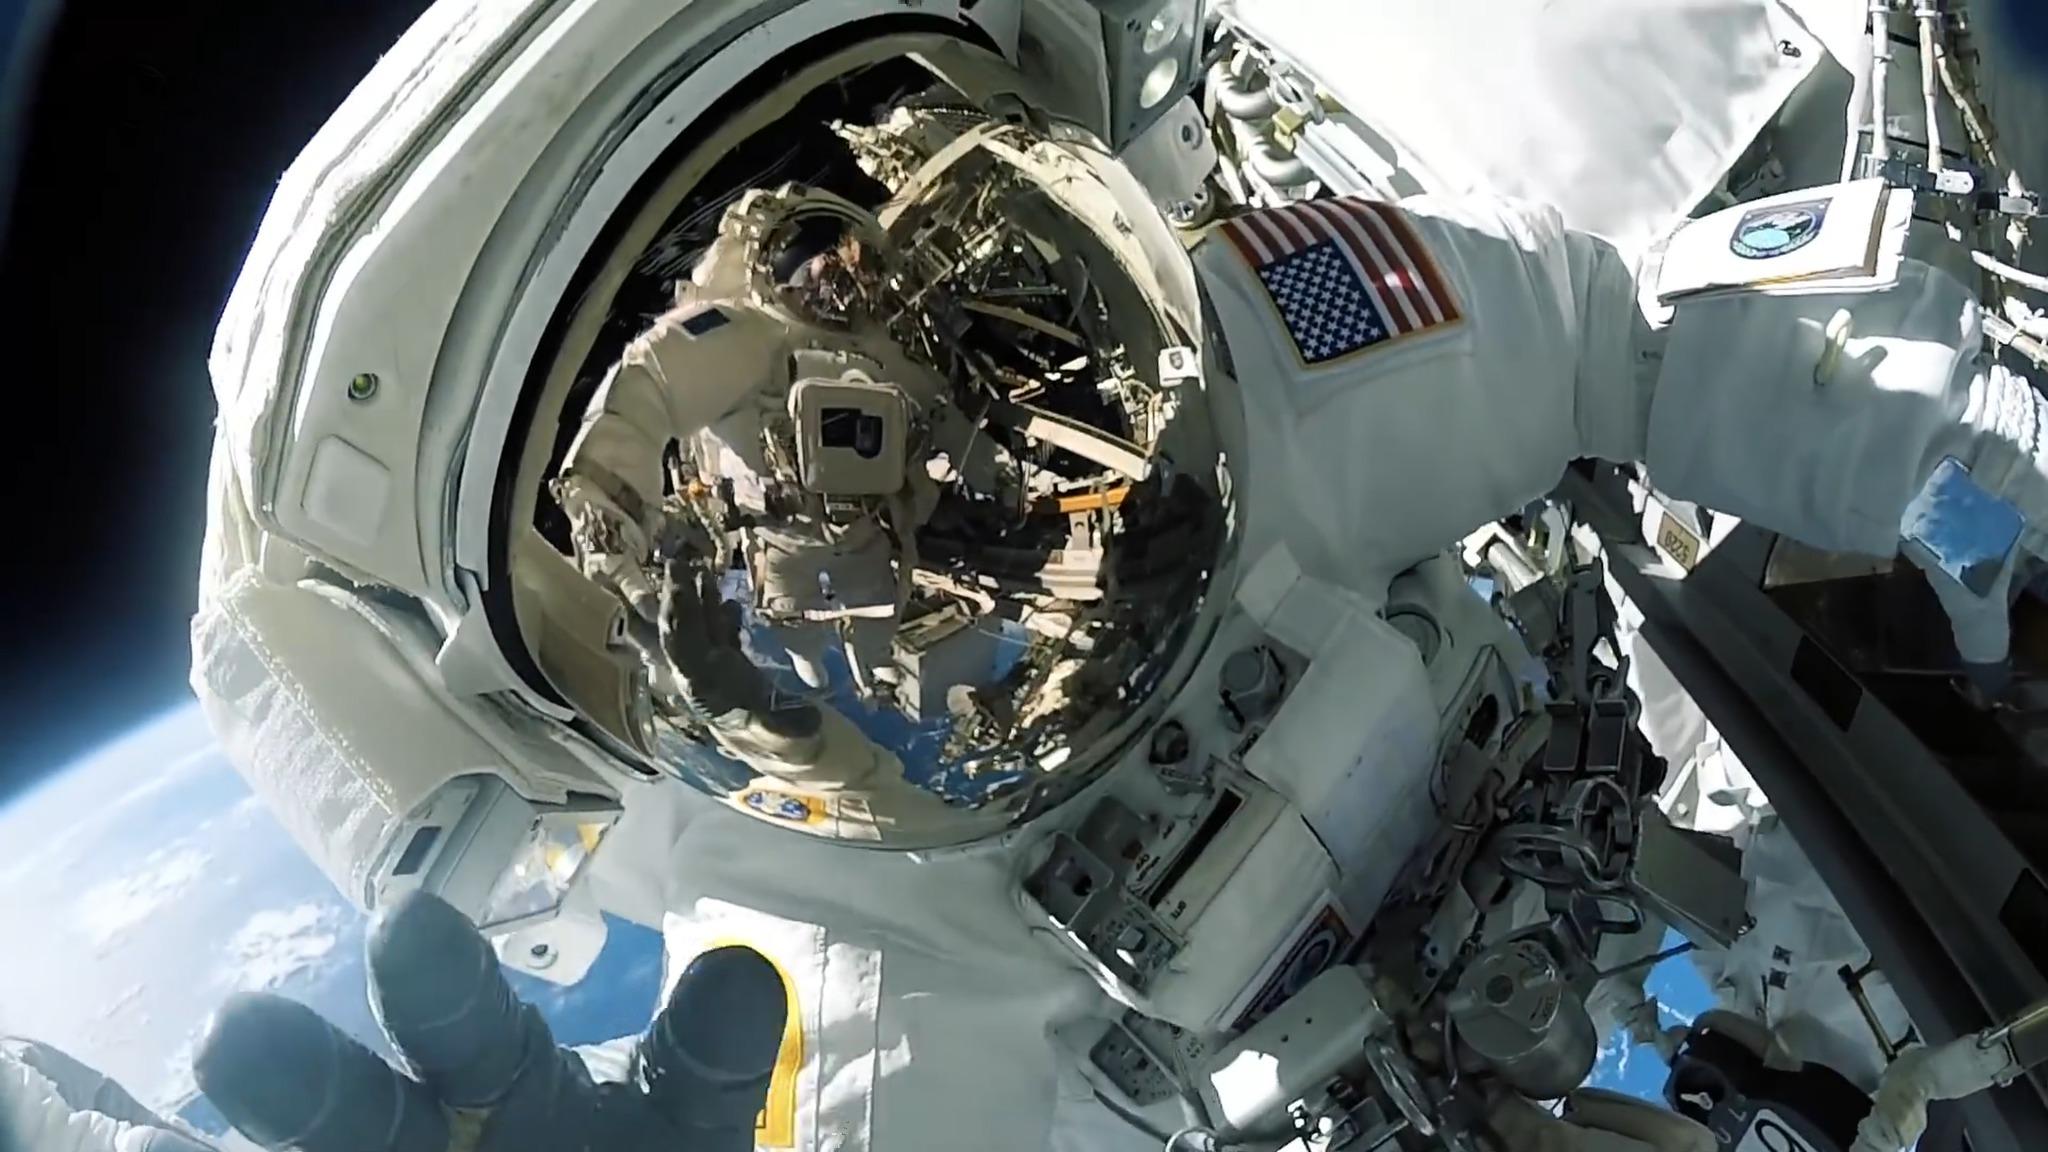 LGD0200144088-Cosmonaute